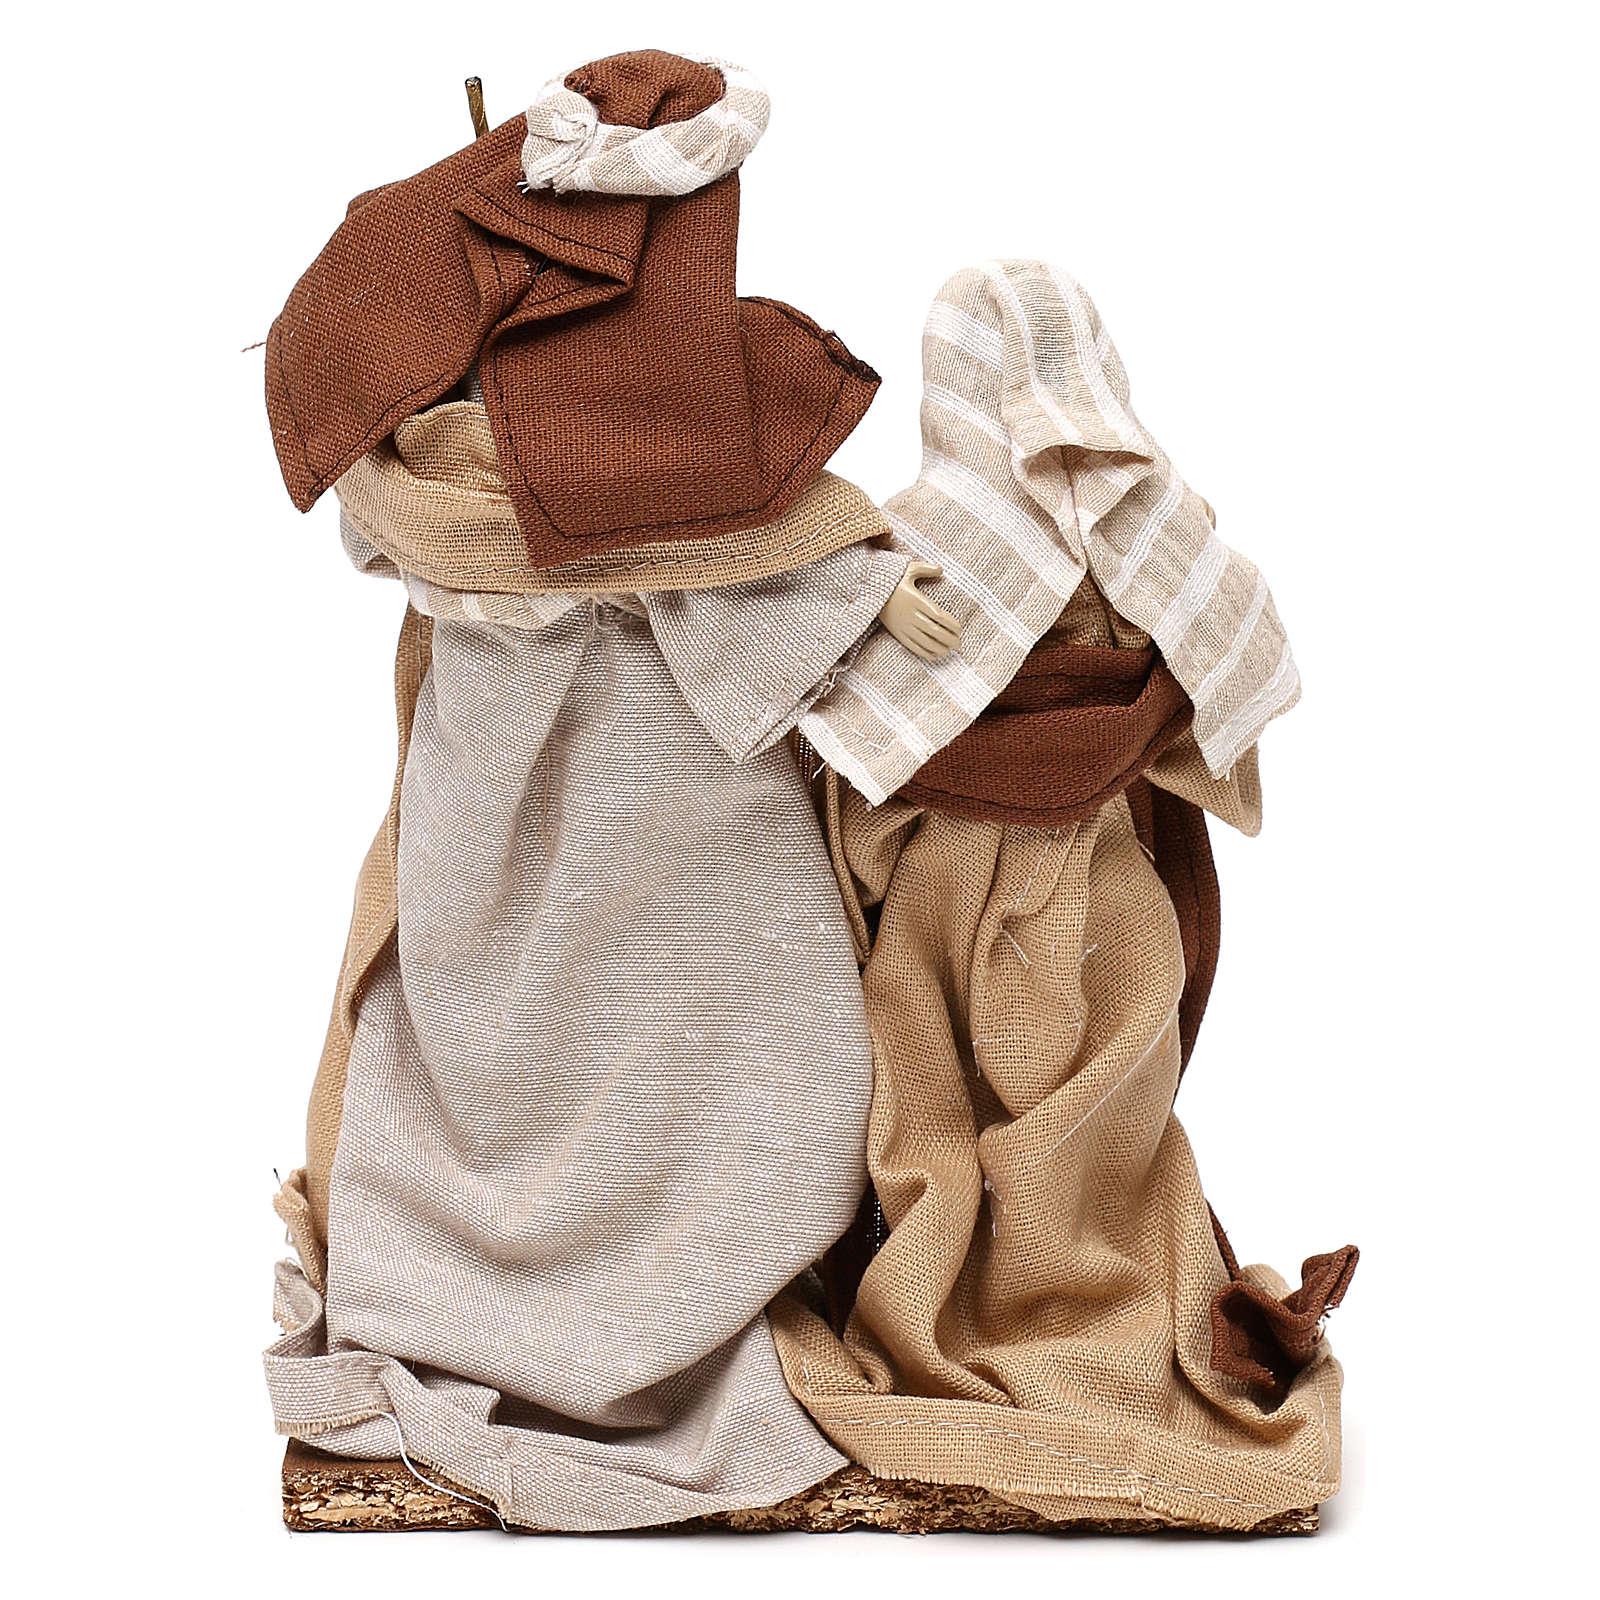 Arabic style Nativity scene with 22 cm beige cloth dresses 3